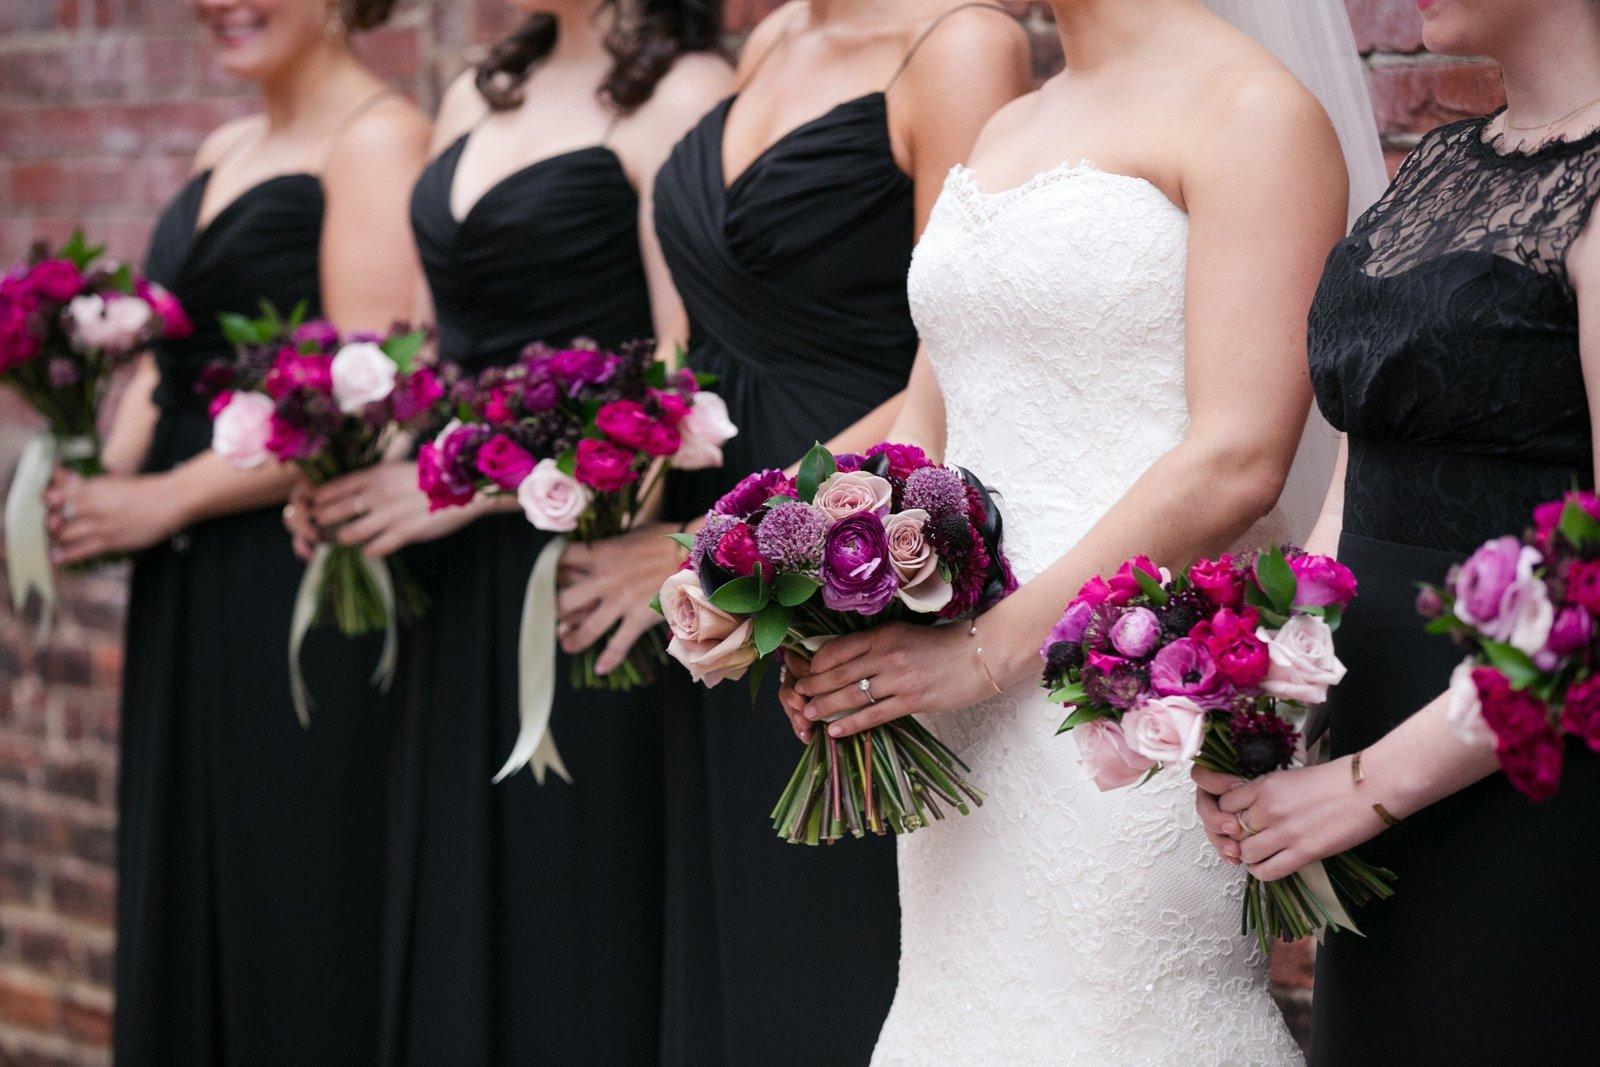 Black-tie-wedding-photos-longview-gallery-dc (160)